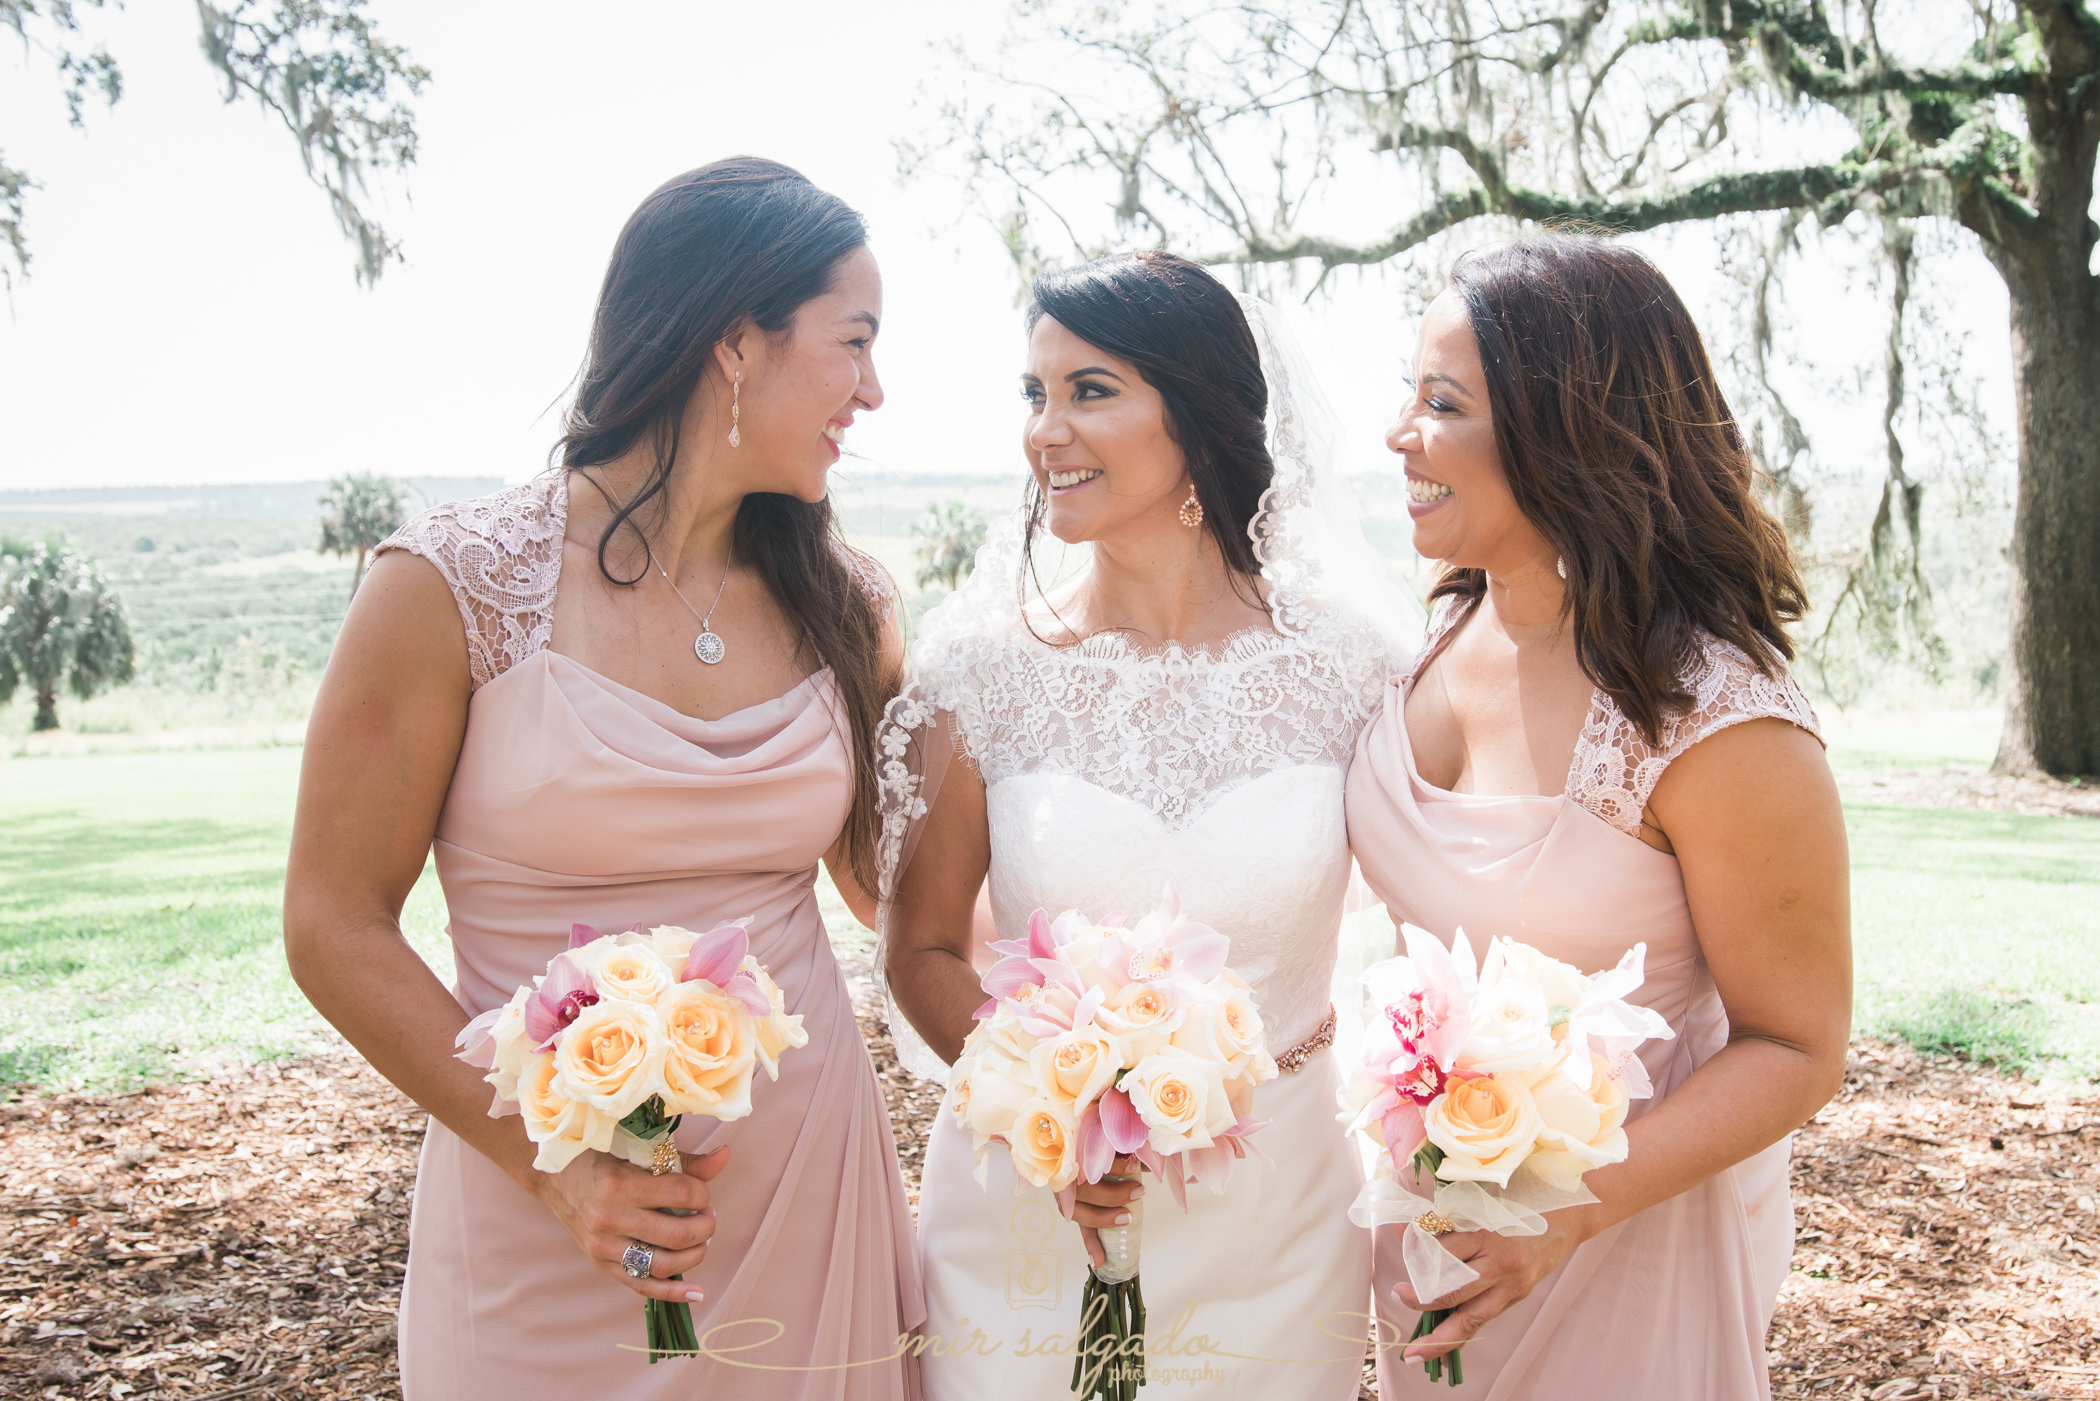 Bride-and-bridemaids-photo, Bok-tower-wedding-photo